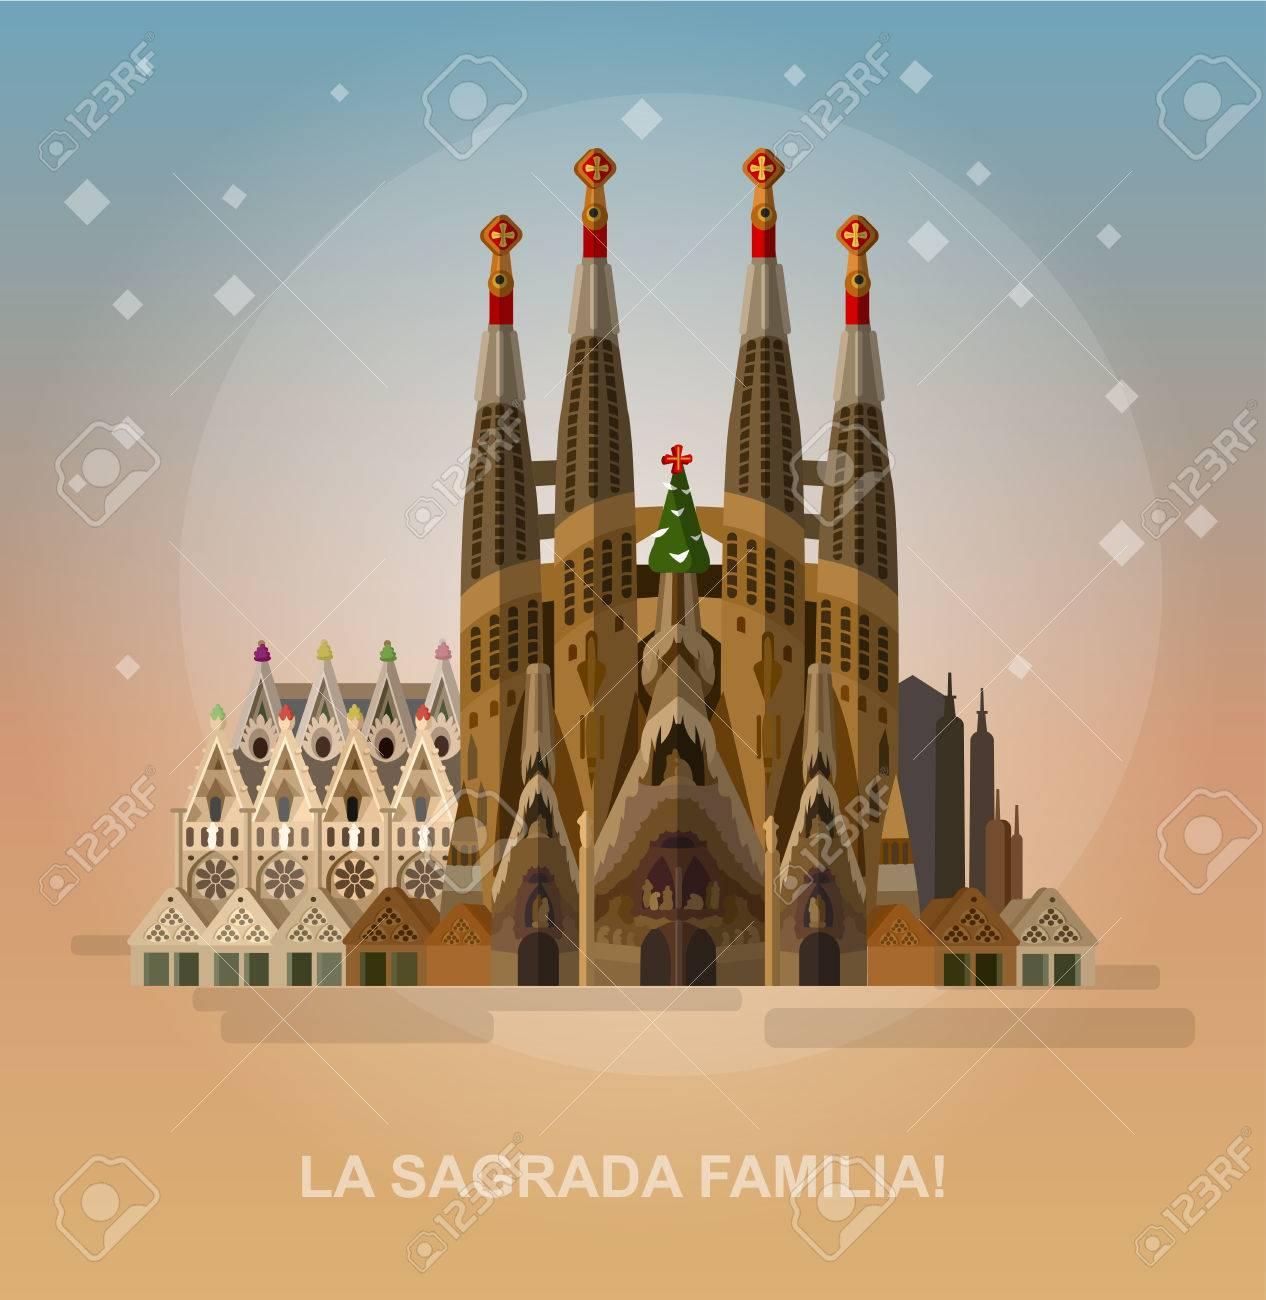 High quality, detailed most famous World landmark. Vector illustration of La Sagrada Familia - the impressive cathedral designed by Gaudi. Travel vector. Travel illustration. Travel landmarks - 57935735